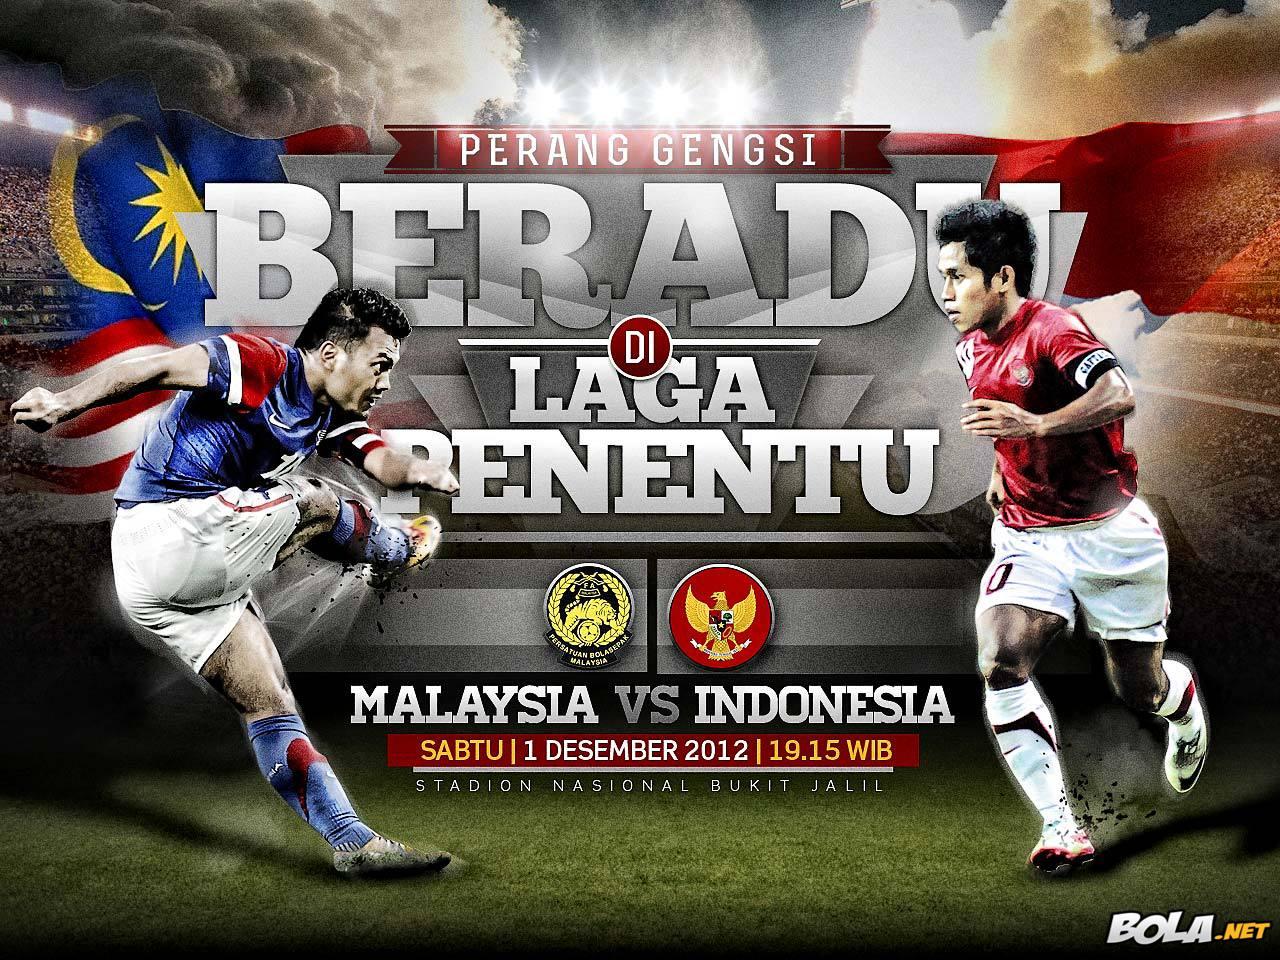 Prediksi Malaysia vs Indonesia Piala AFF 1 Desember 2012